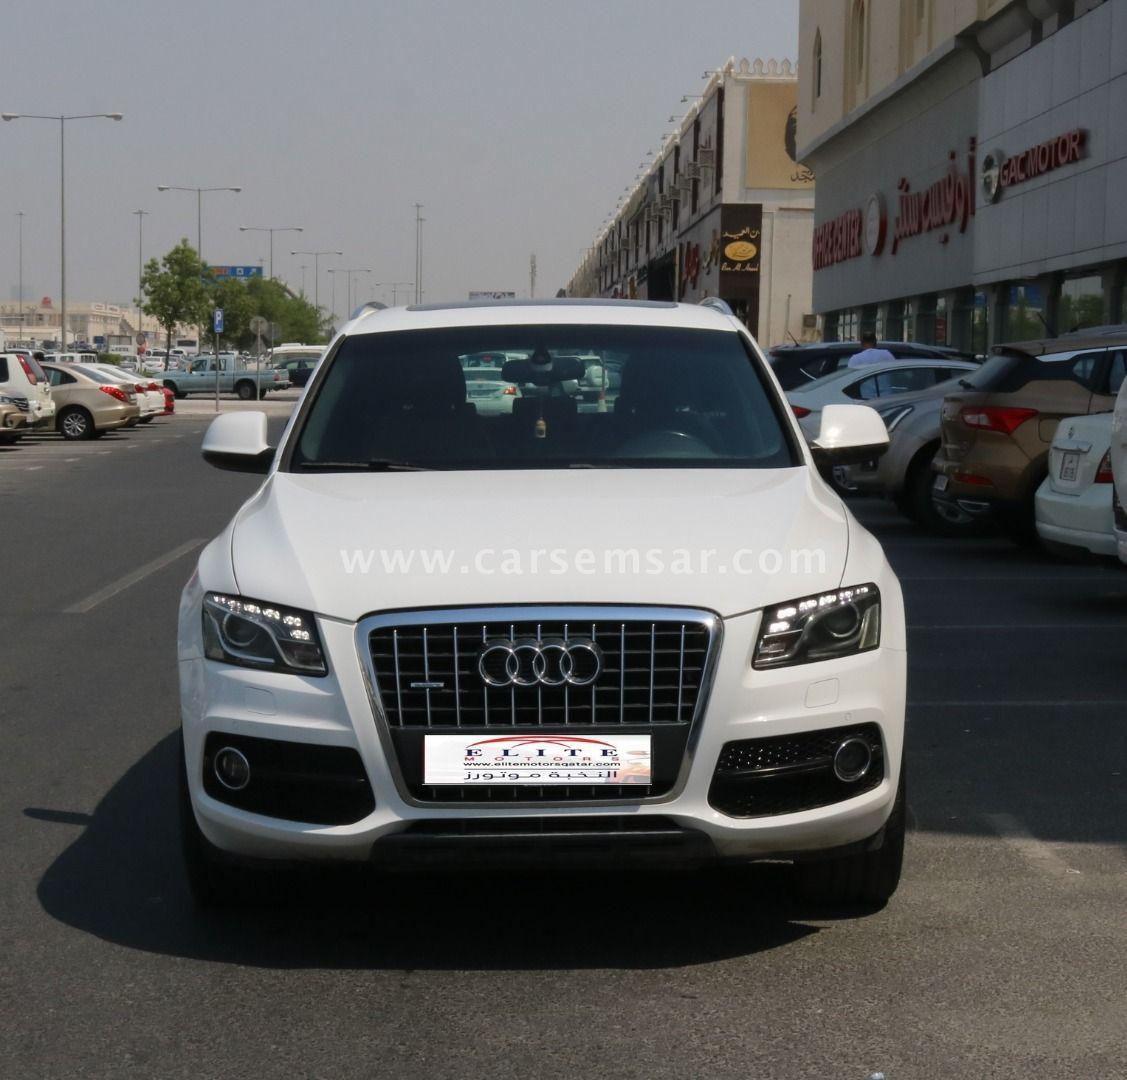 2012 Audi Q5 2.0 TFSi For Sale In Qatar